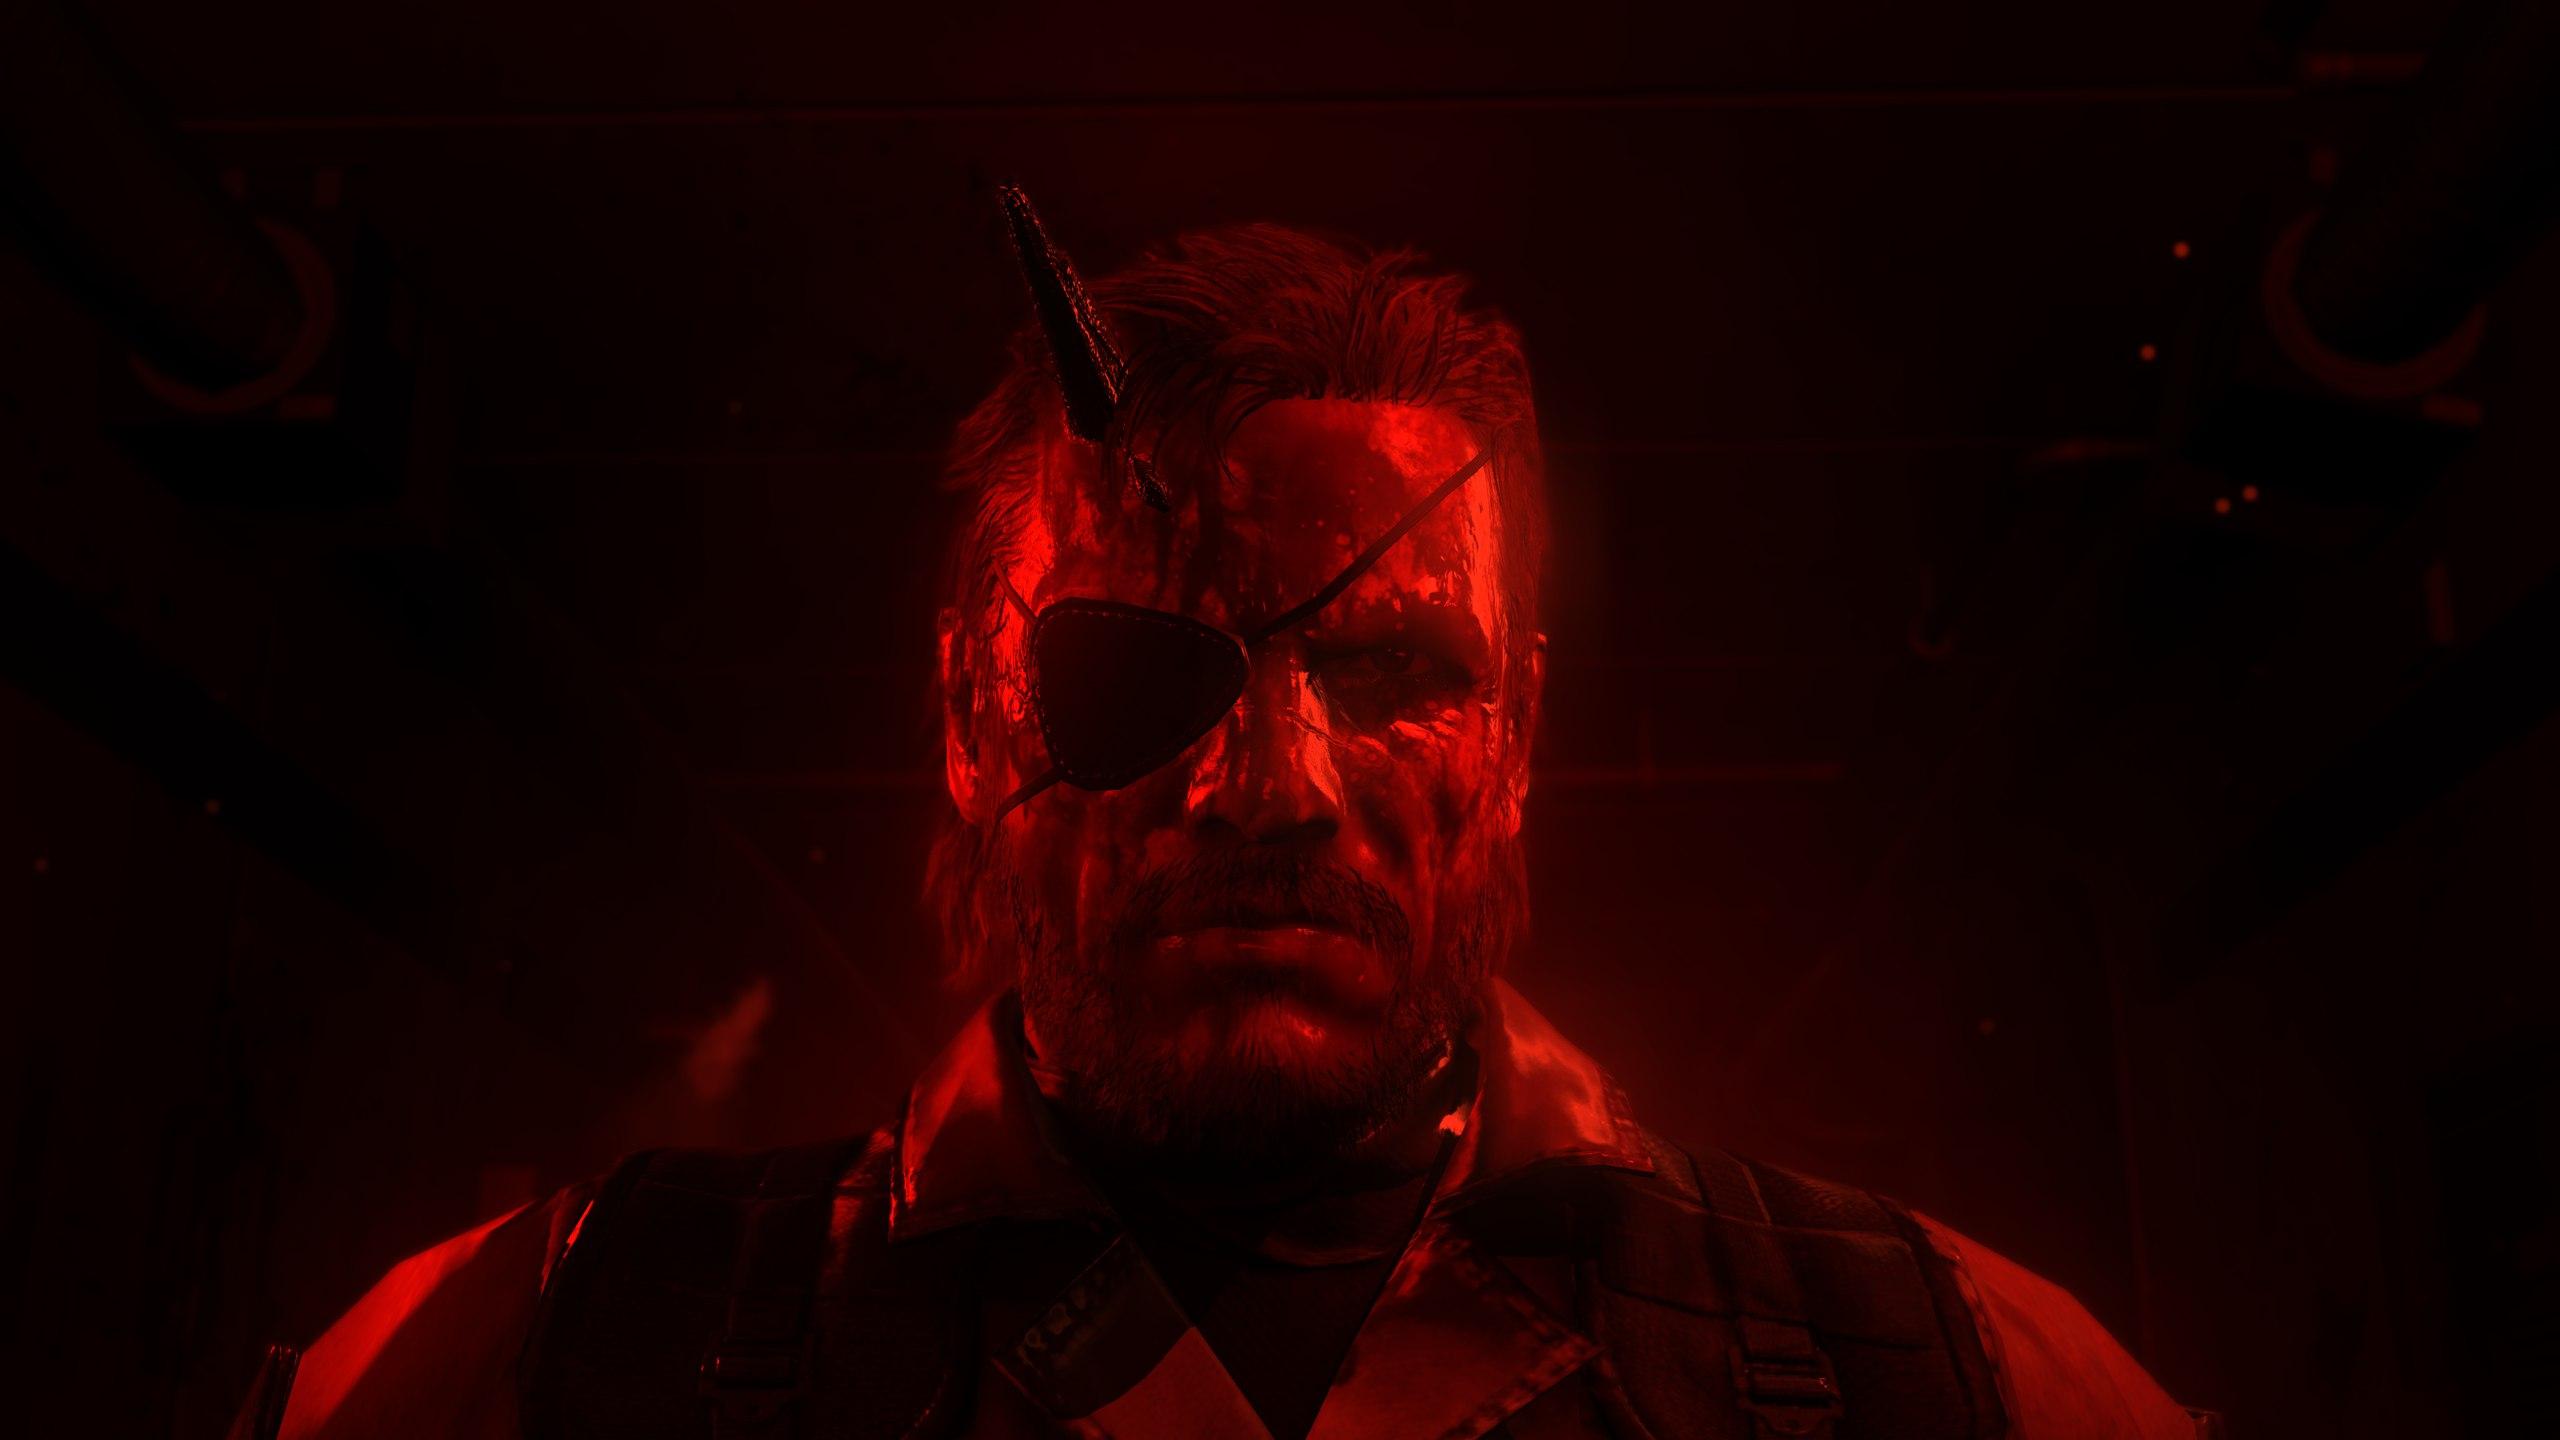 Wallpaper Metal Gear Solid V The Phantom Pain Snake 2560x1440